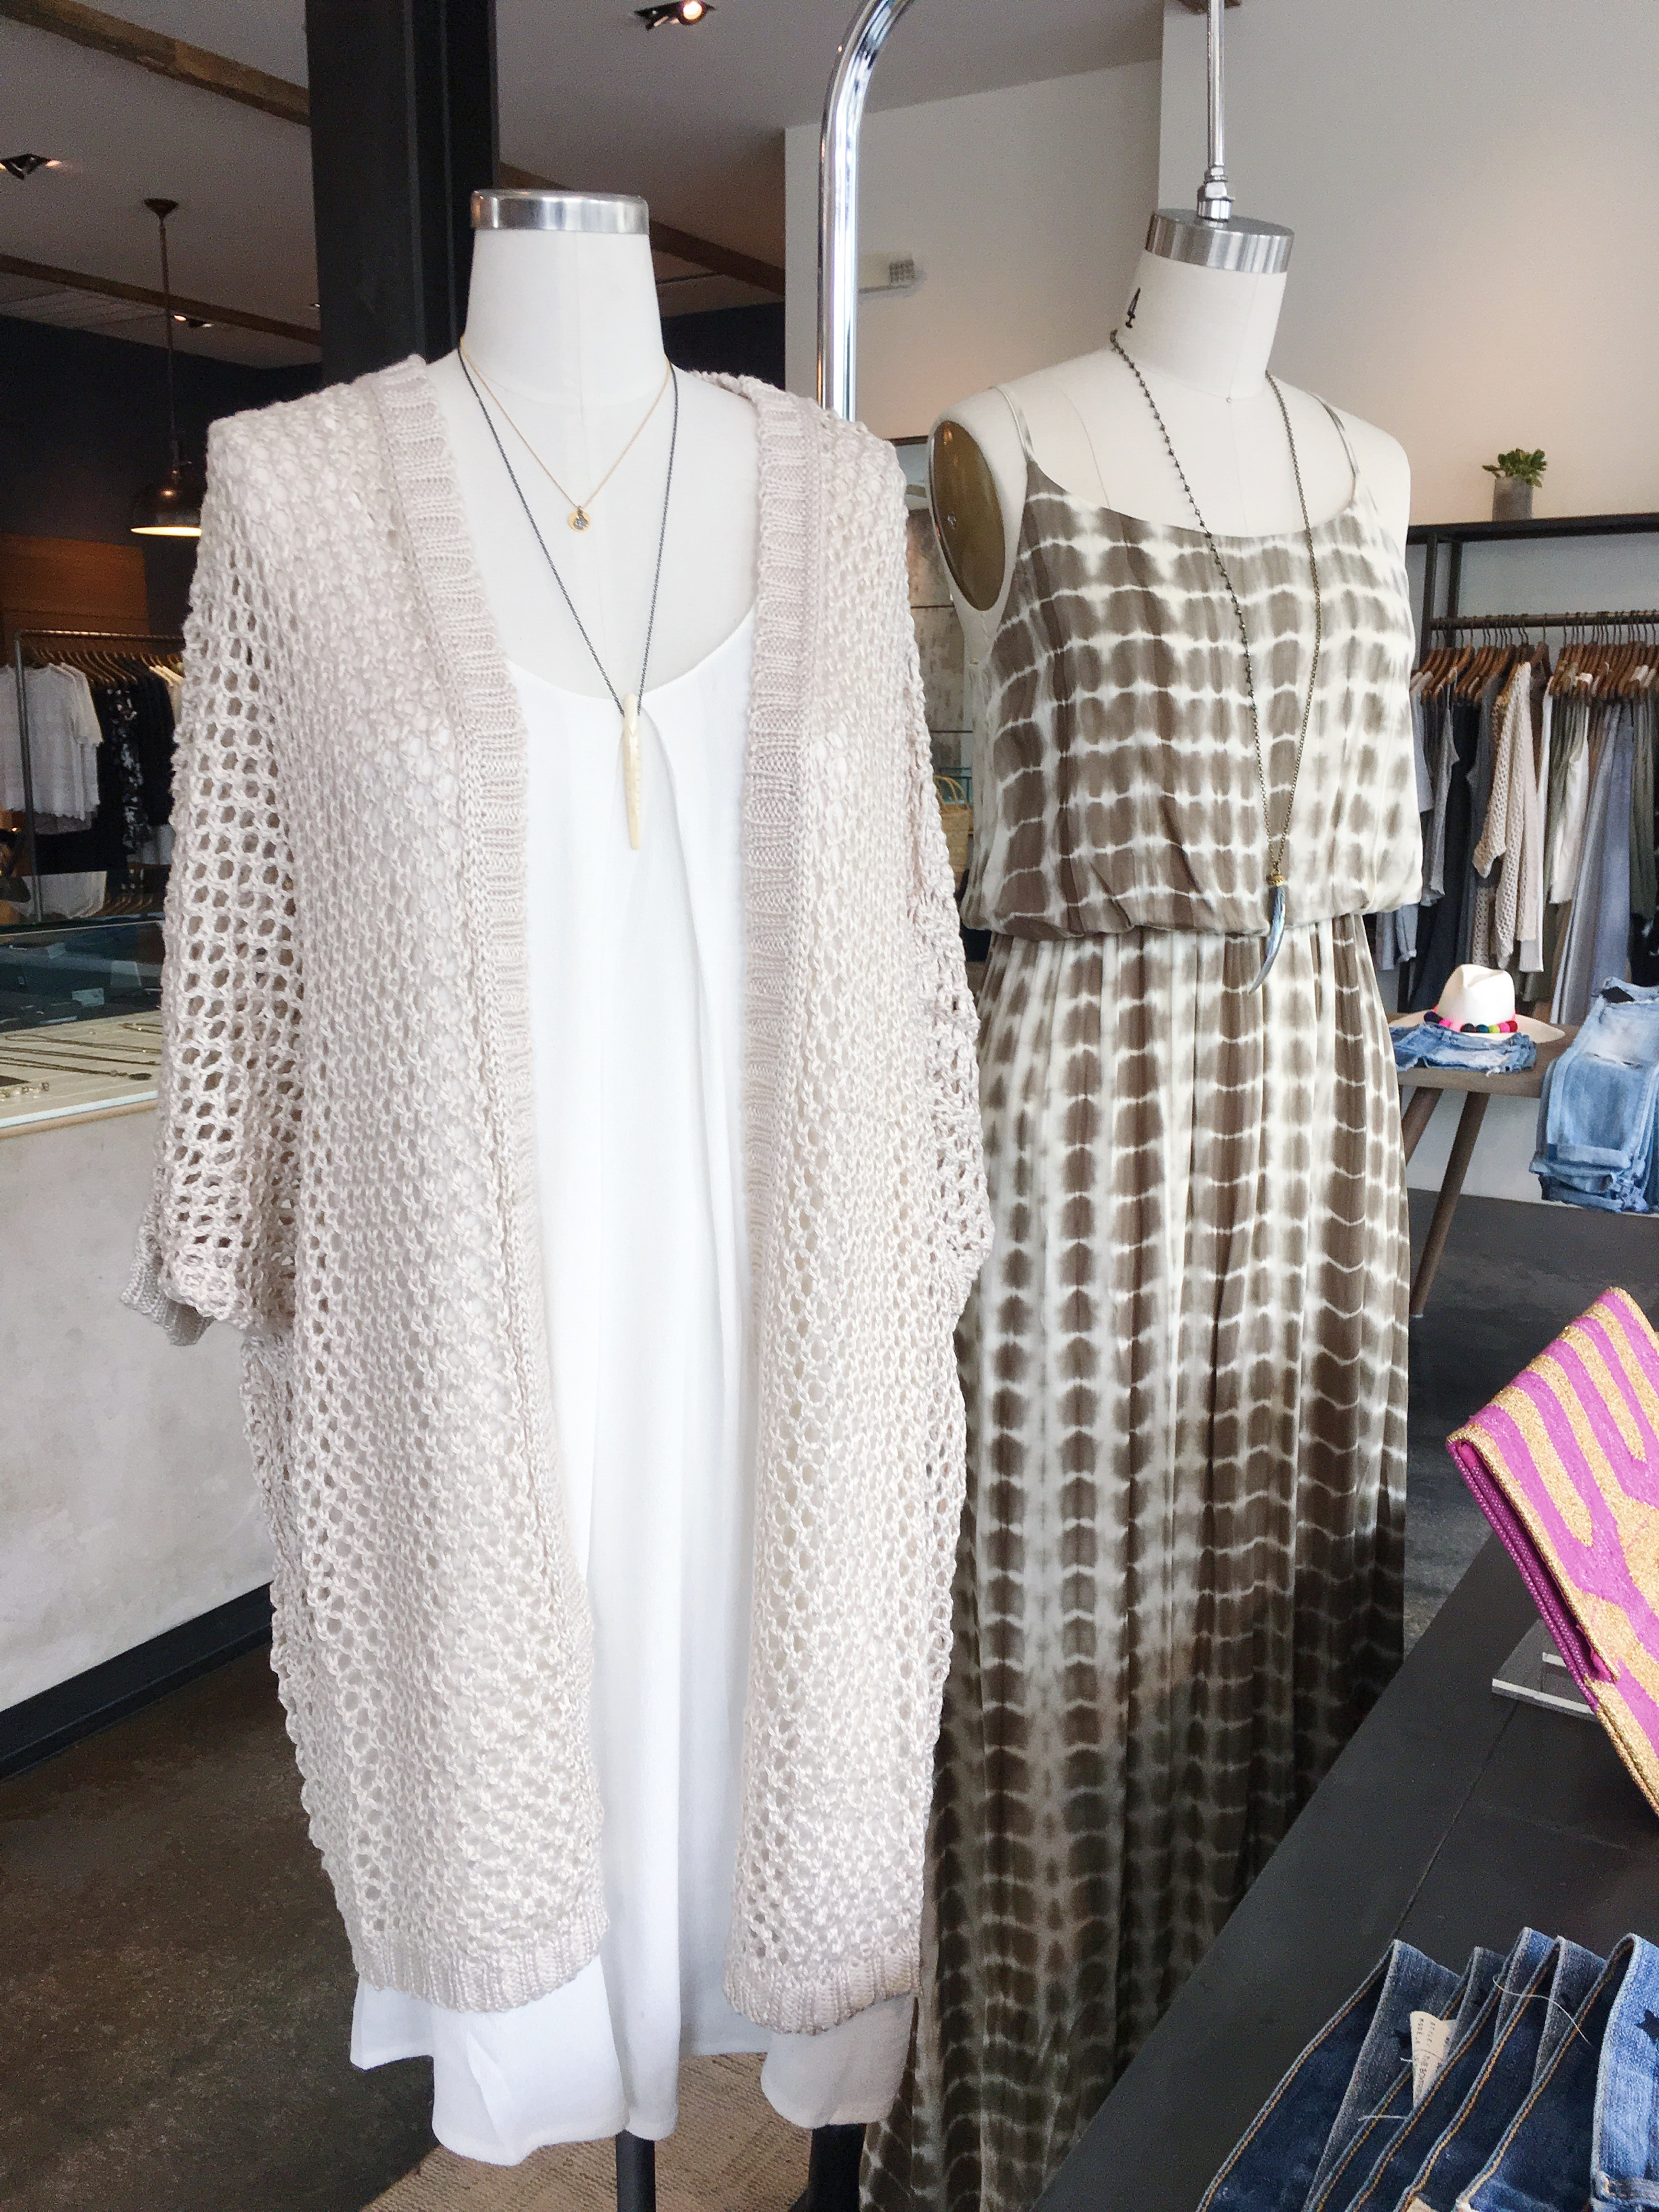 Slip Dress and Open Weave Cardigan